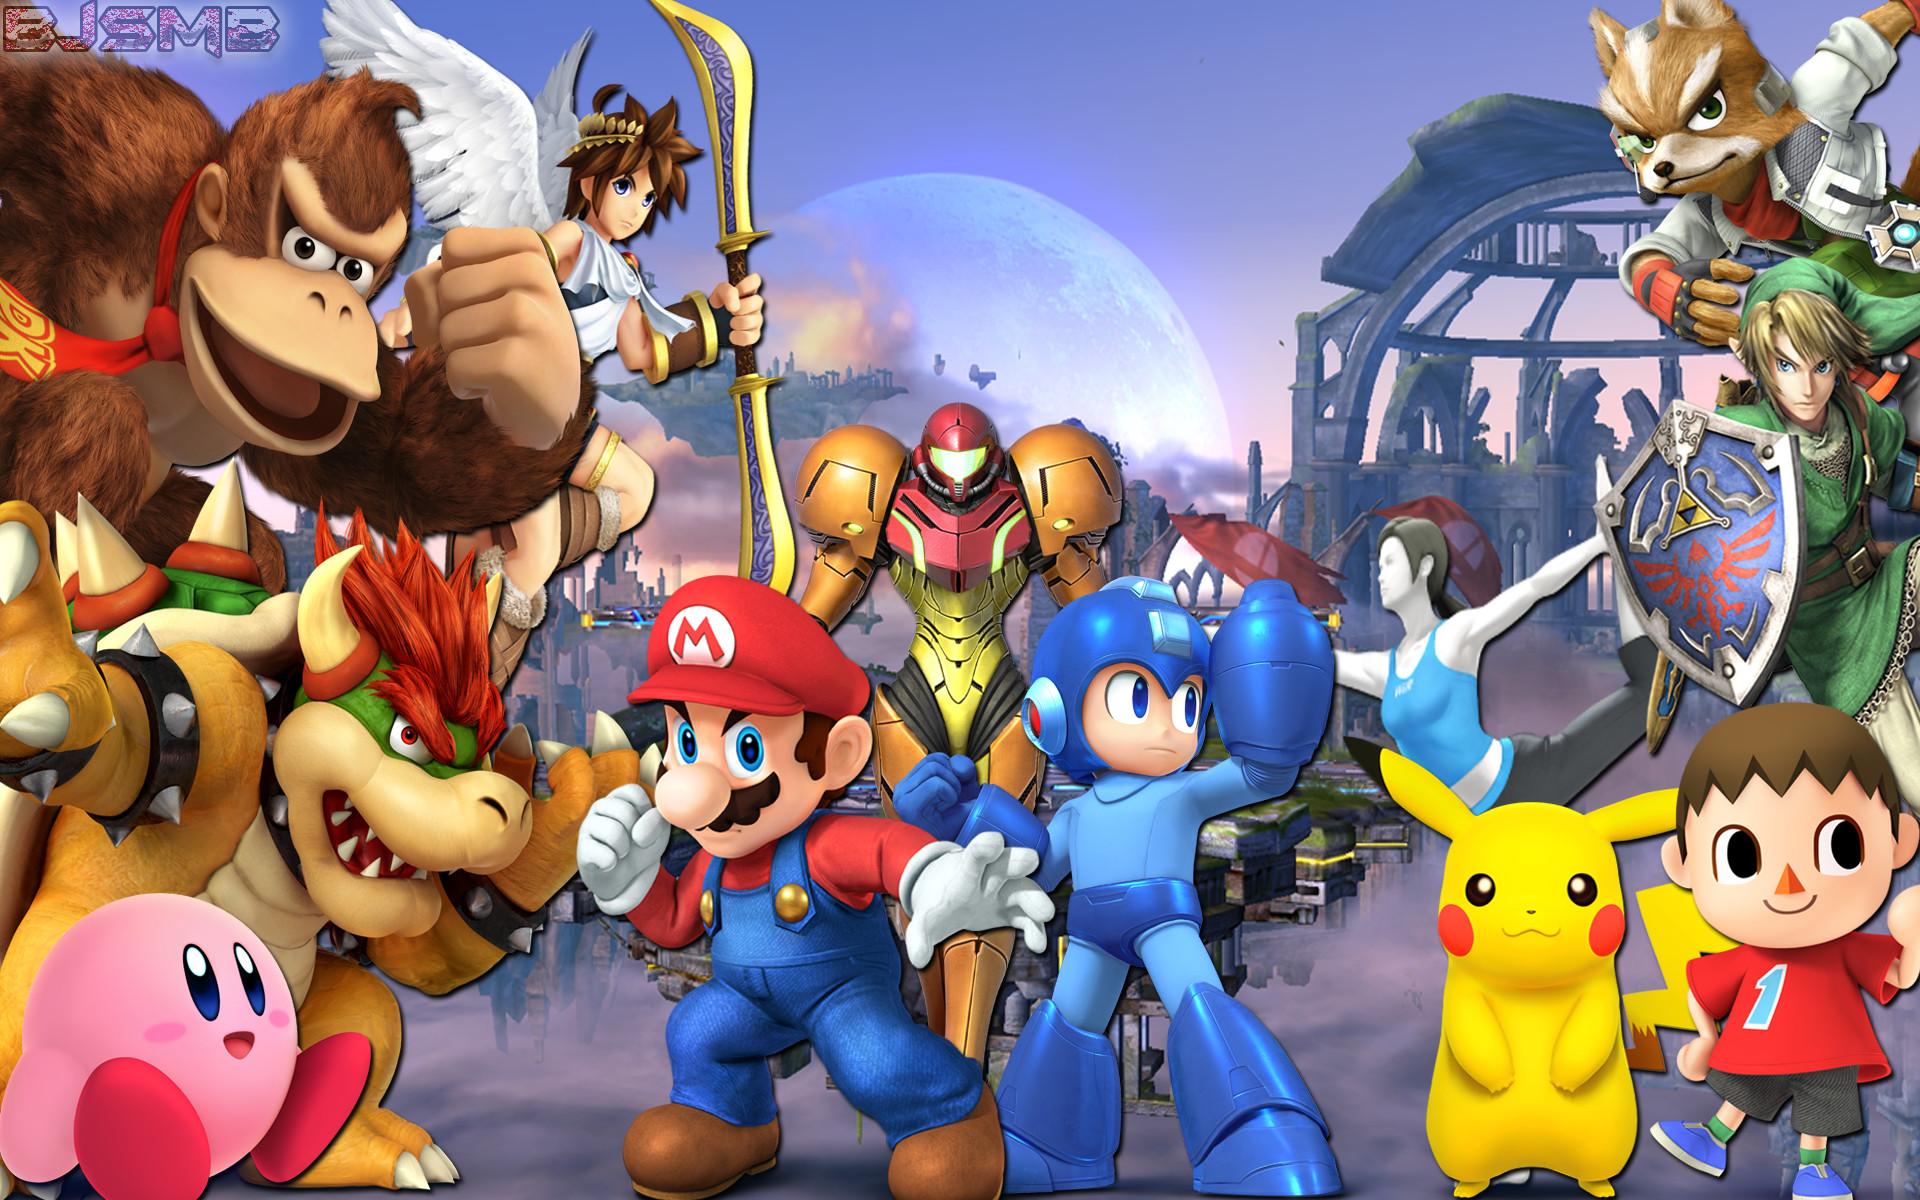 … Super Smash Bros 4: Confirmed Characters Wallpaper by BowserJrSMB